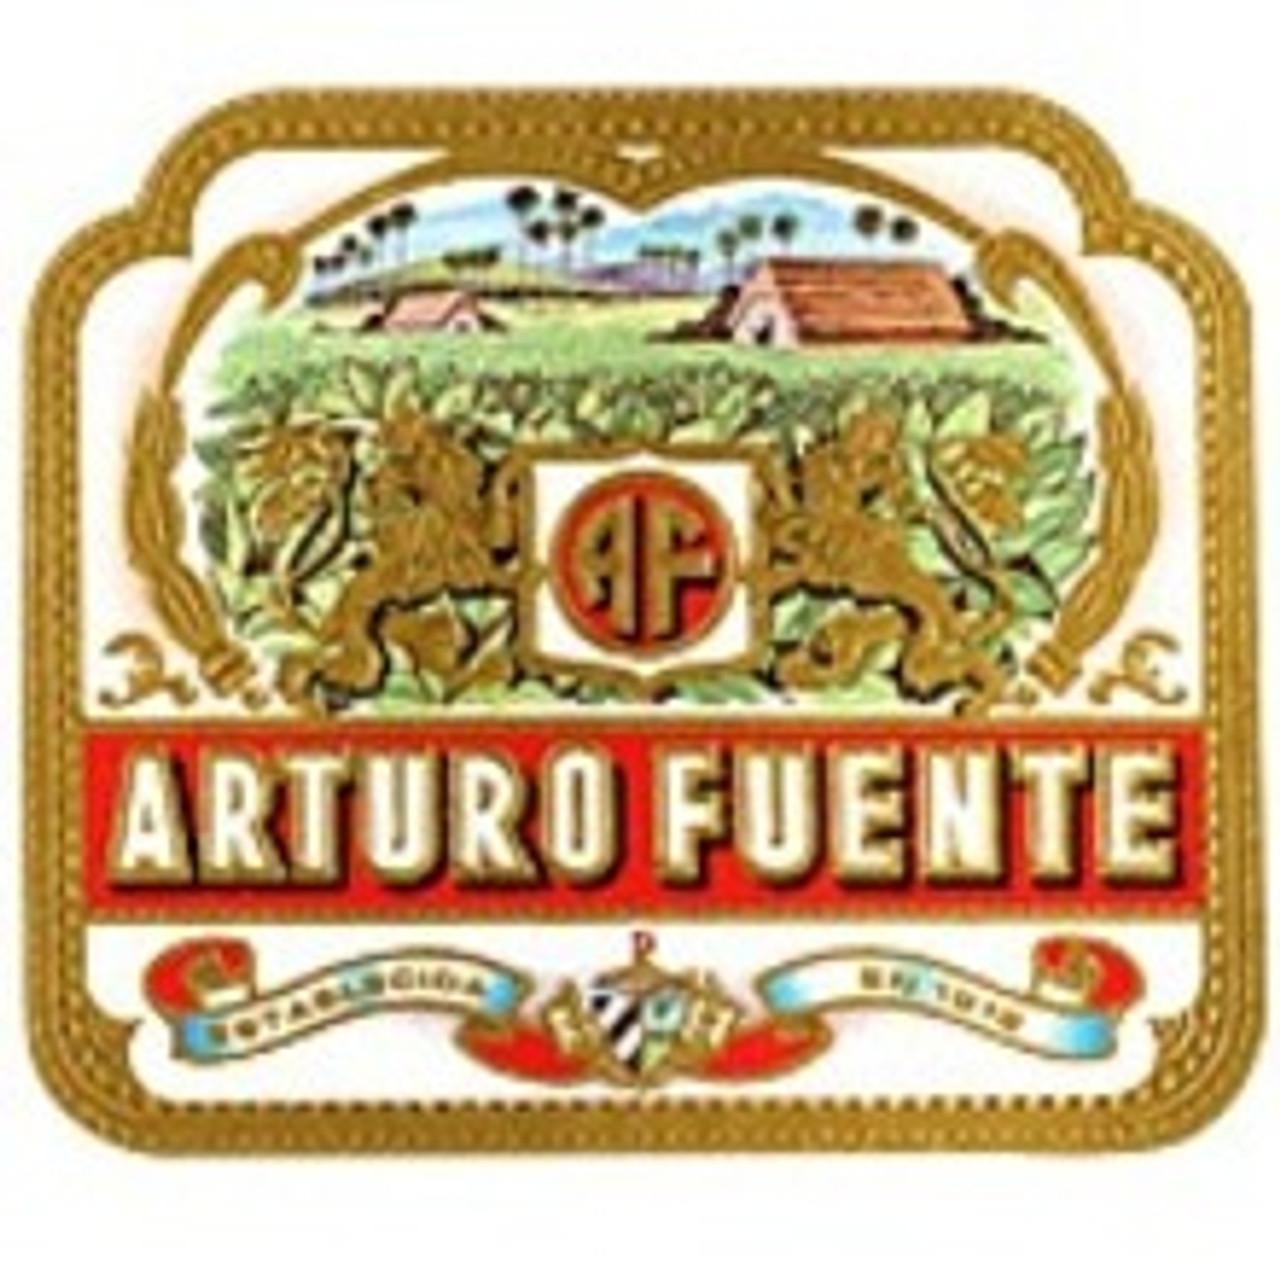 Arturo Fuente Canones Natural Cigars - 8 1/2 x 52 (Box of 20)